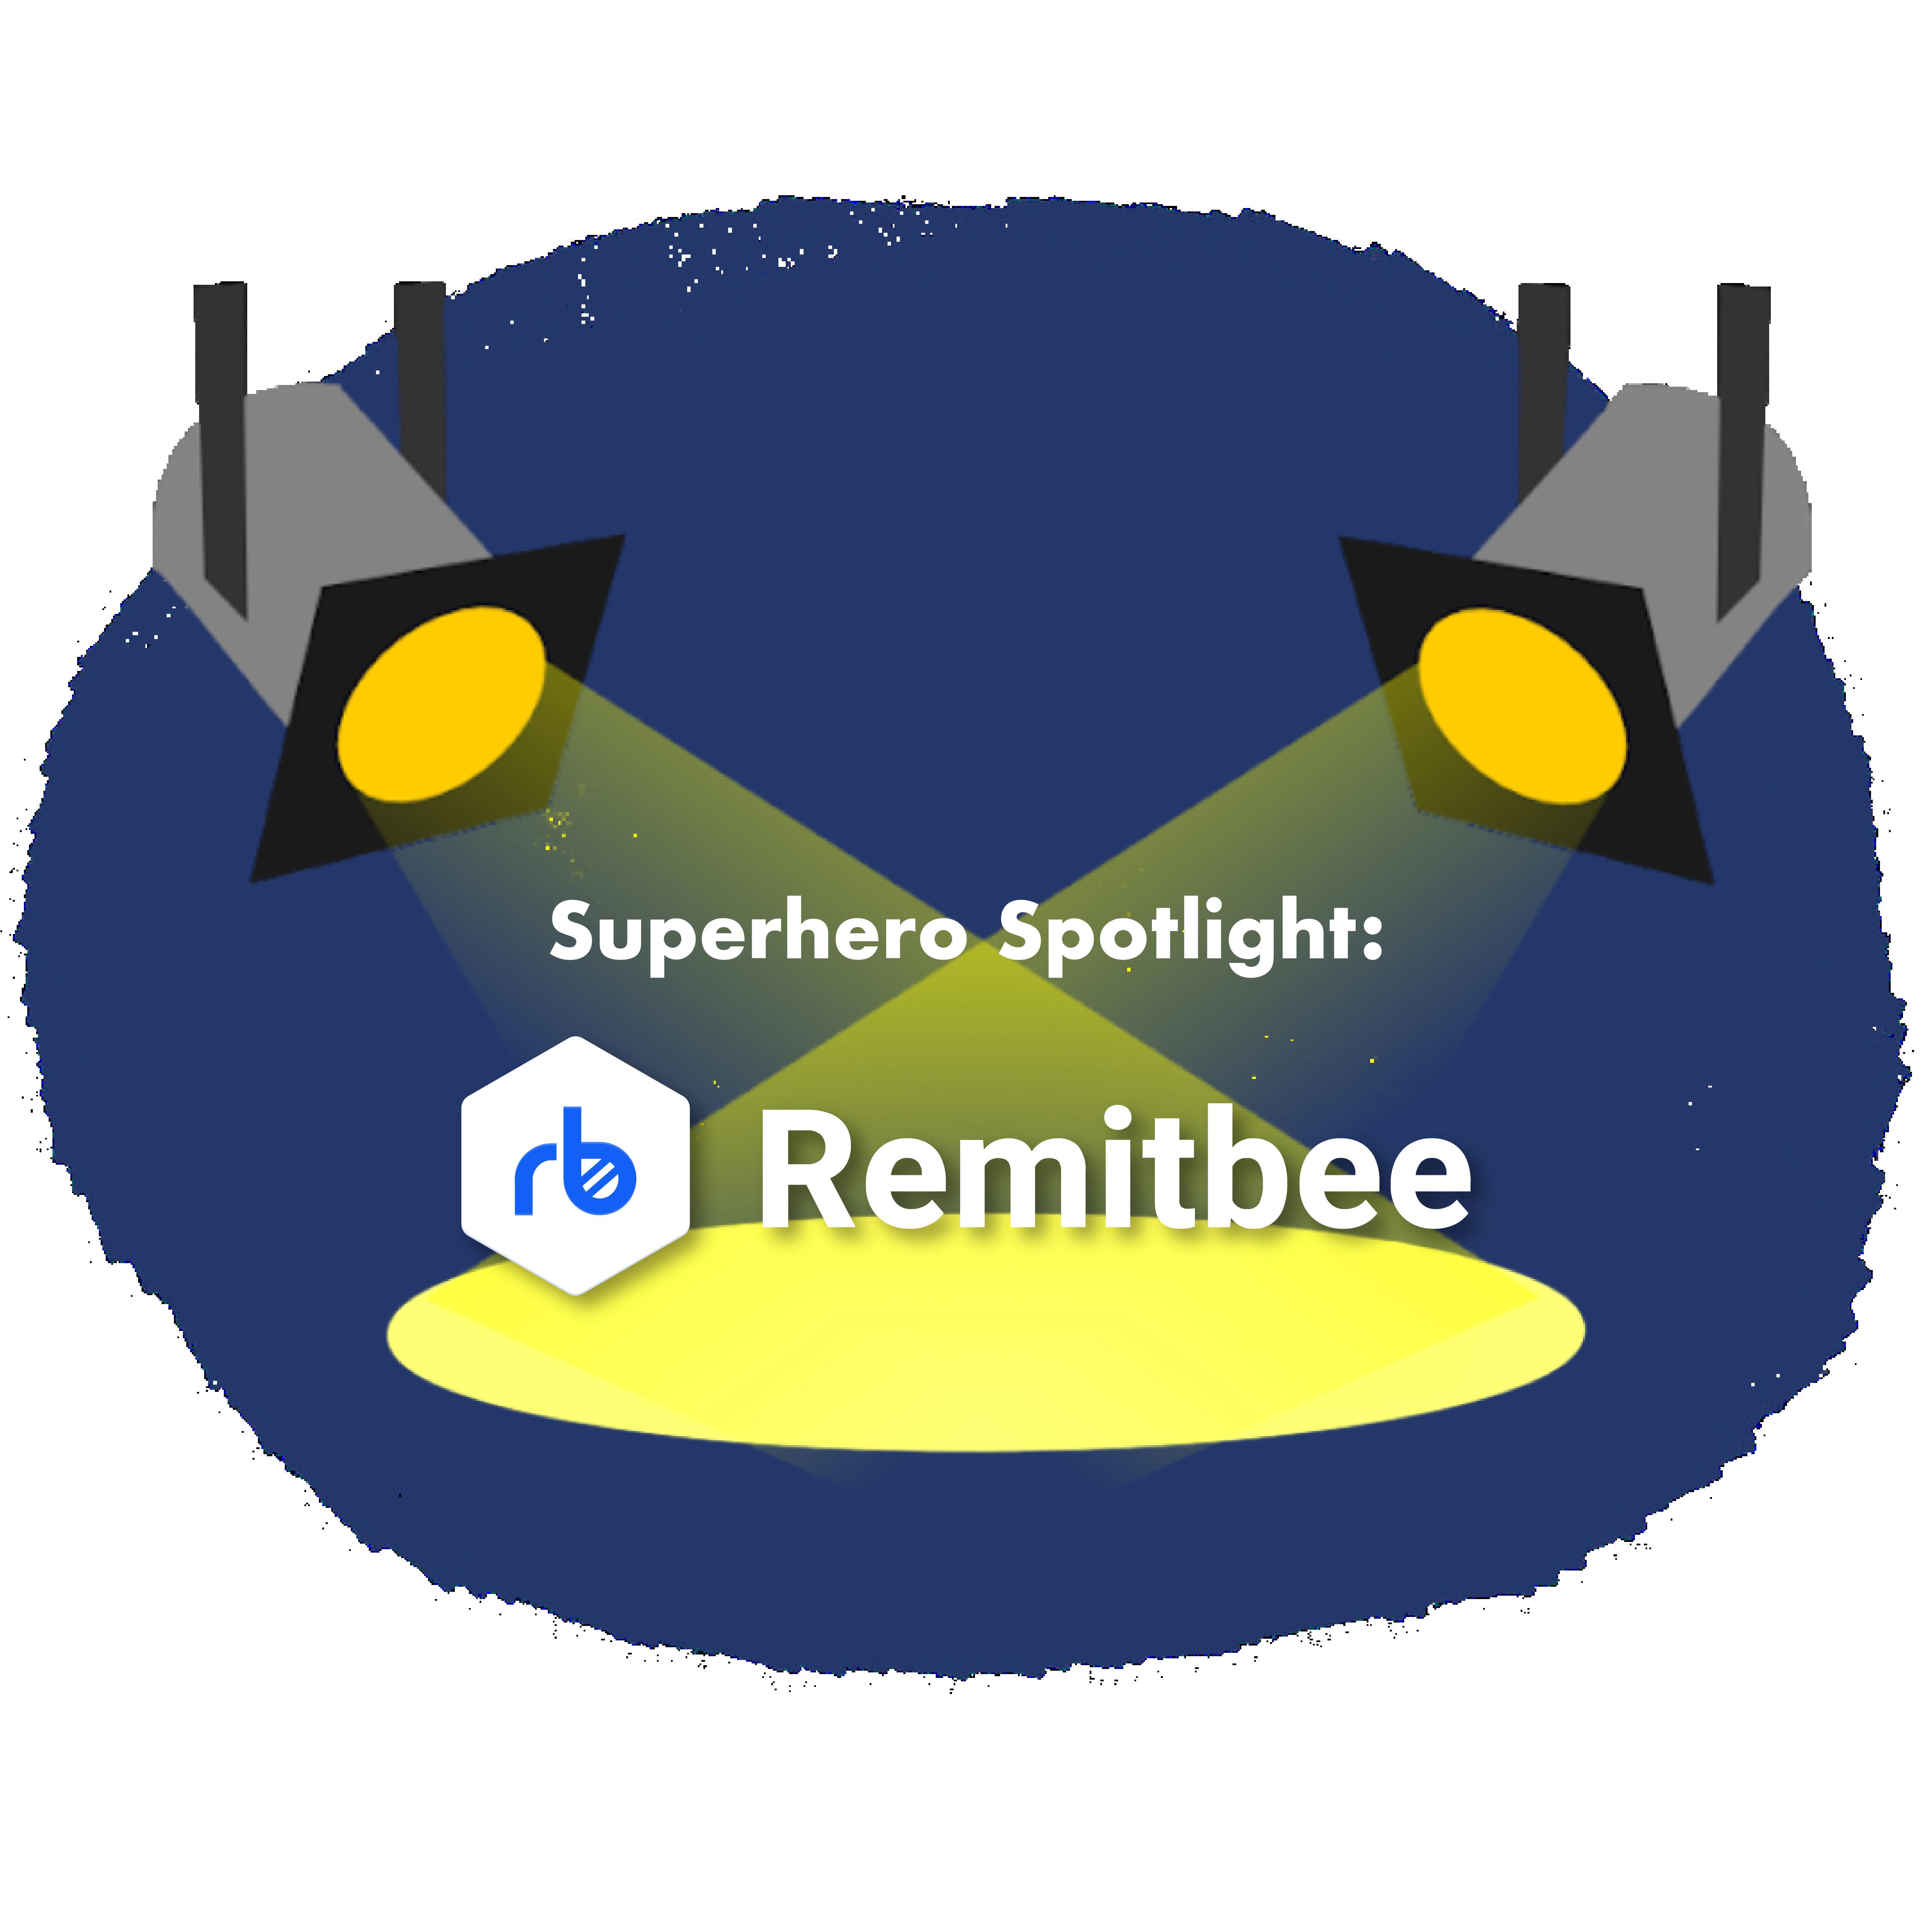 Remitbee Featured in Cuarrency Cloud's Superhero Spotlight